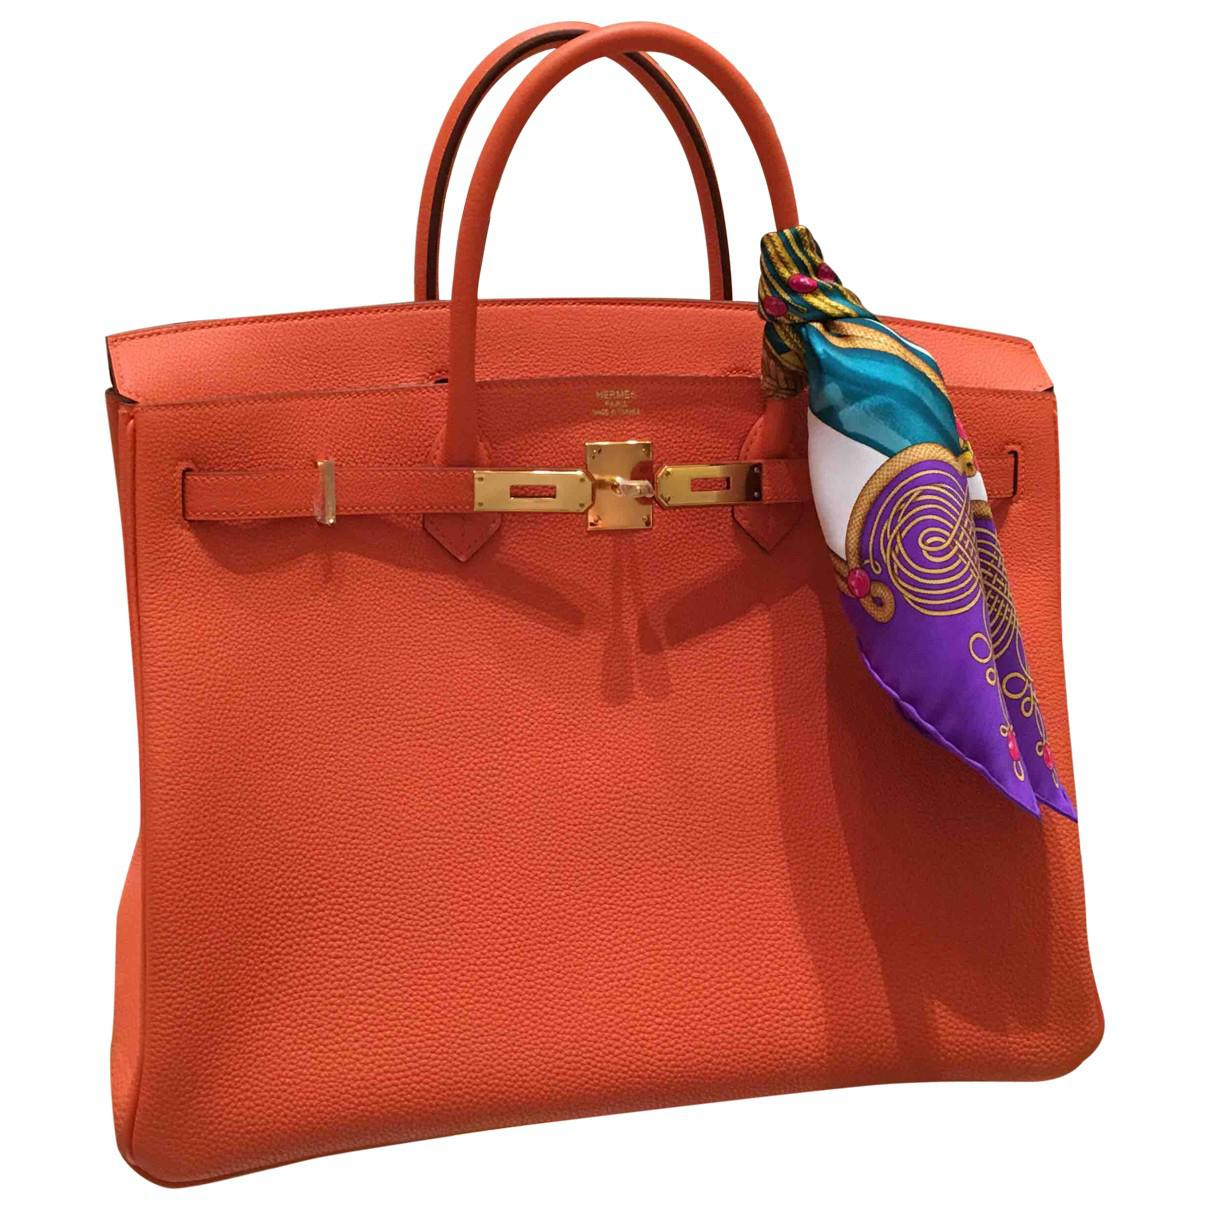 Lyst - Hermès Pre-owned Birkin Leather Handbag in Orange 12acb1bc2